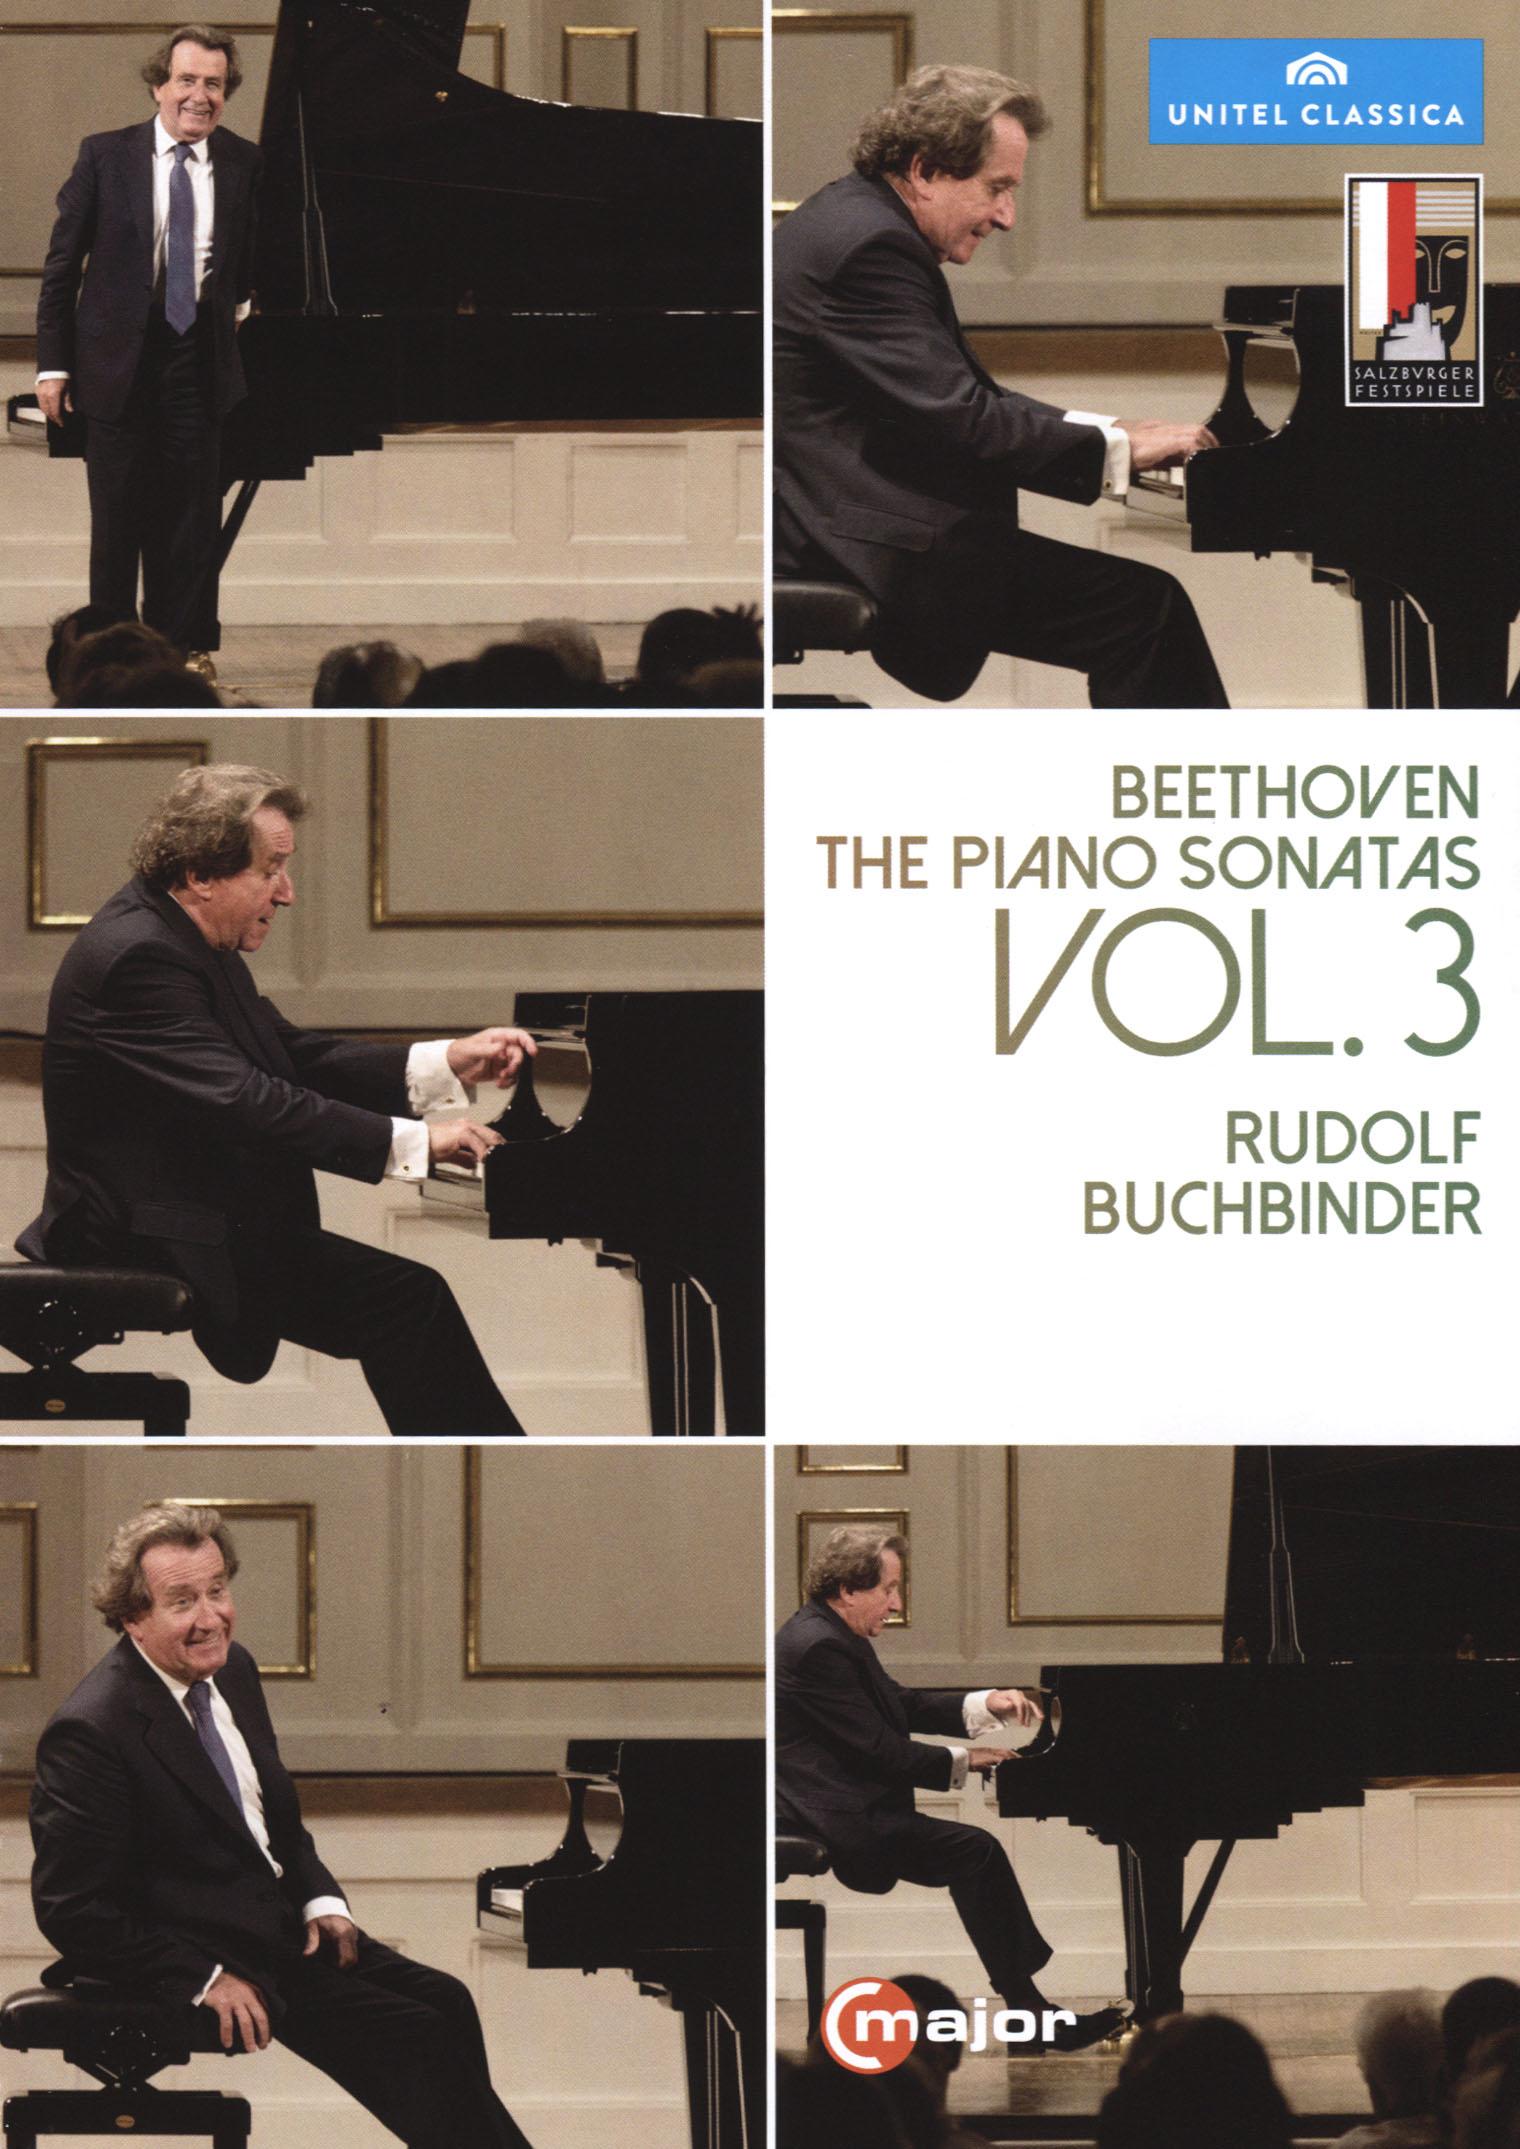 Rudolf Buchbinder: Beethoven - The Piano Sonatas Vol. 3